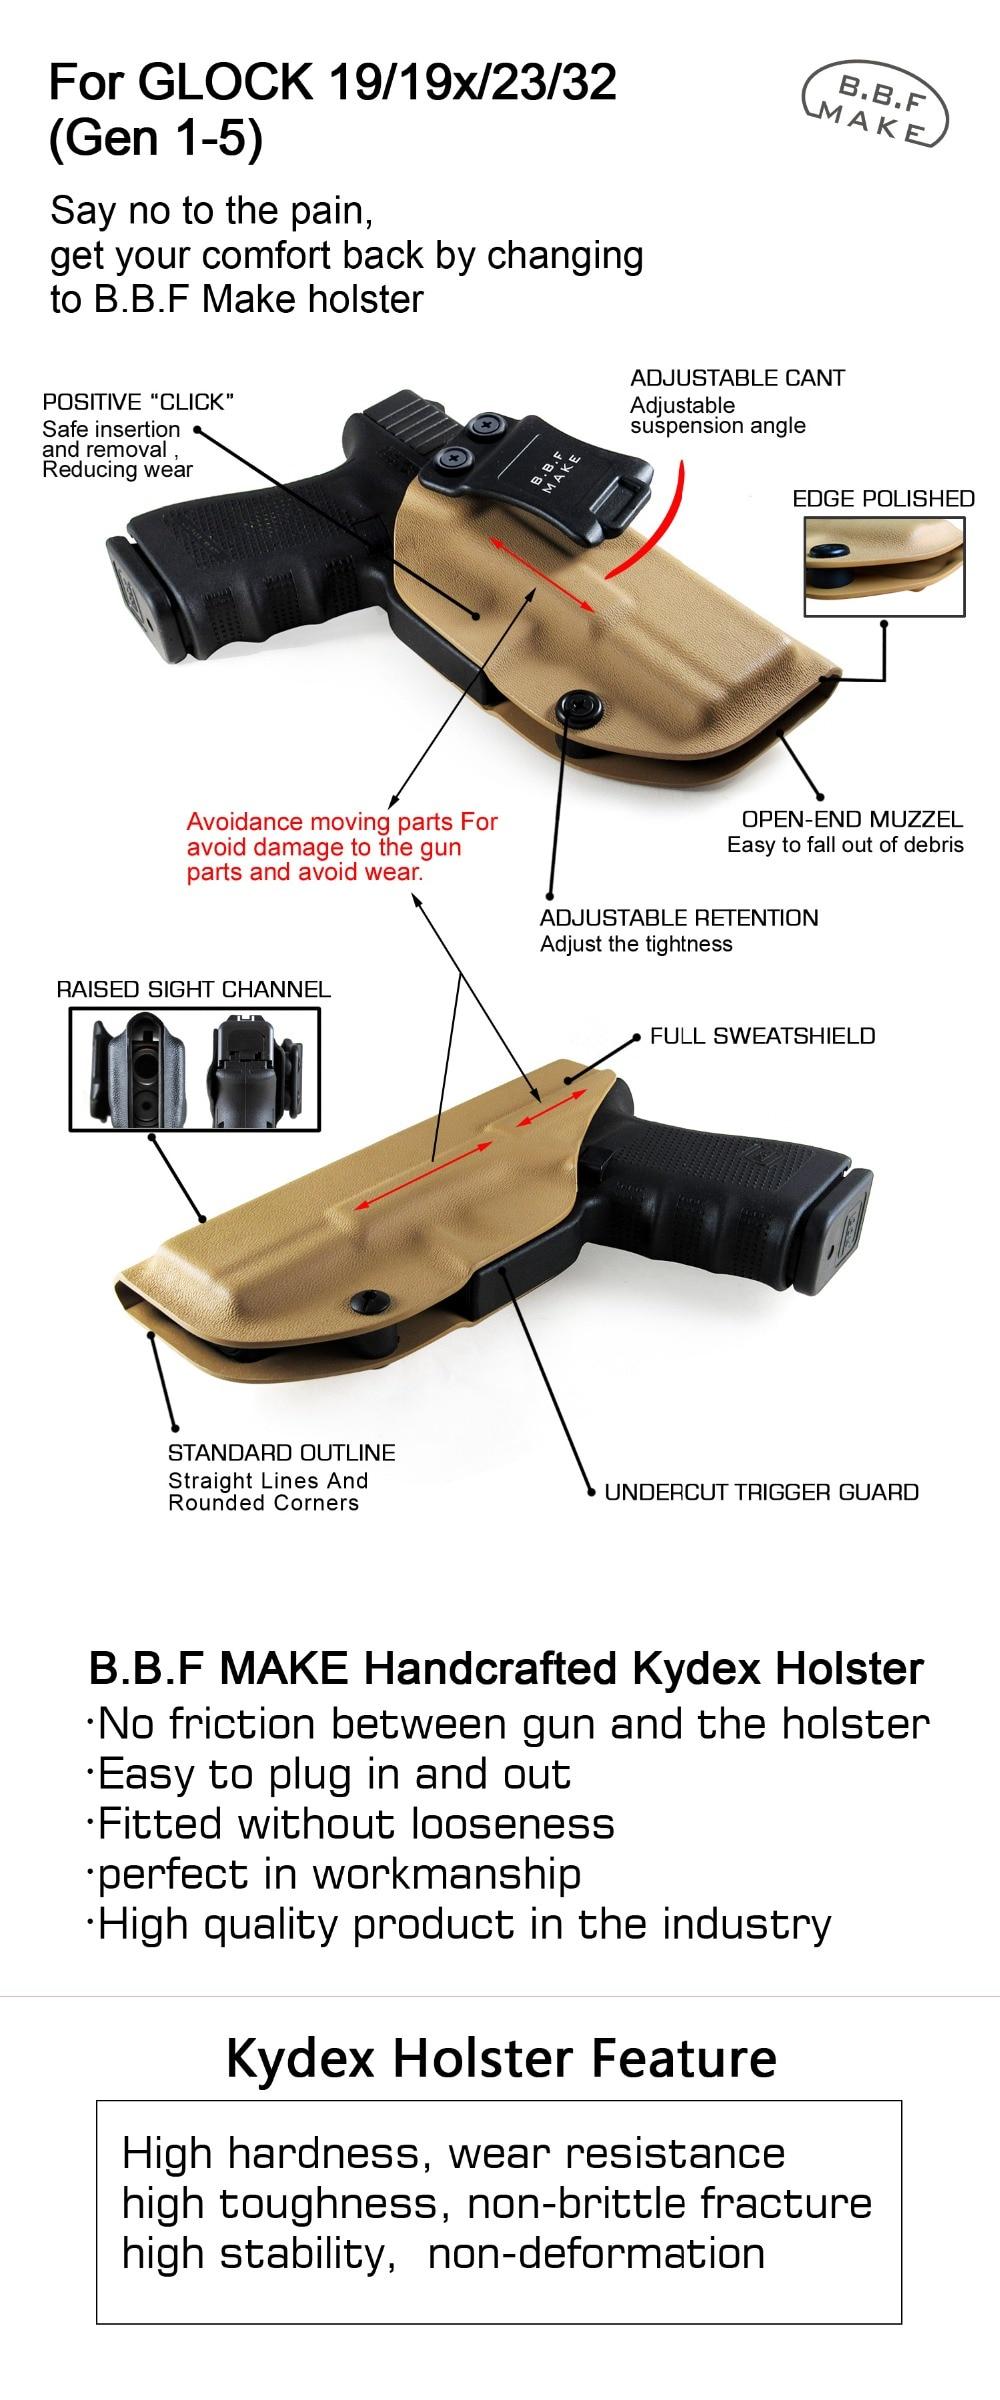 B B F Make IWB Tactical KYDEX Gun Holster Glock 19 17 25 26 27 28 43 22 23  31 32 Inside Concealed Carry Pistol Case Accessories